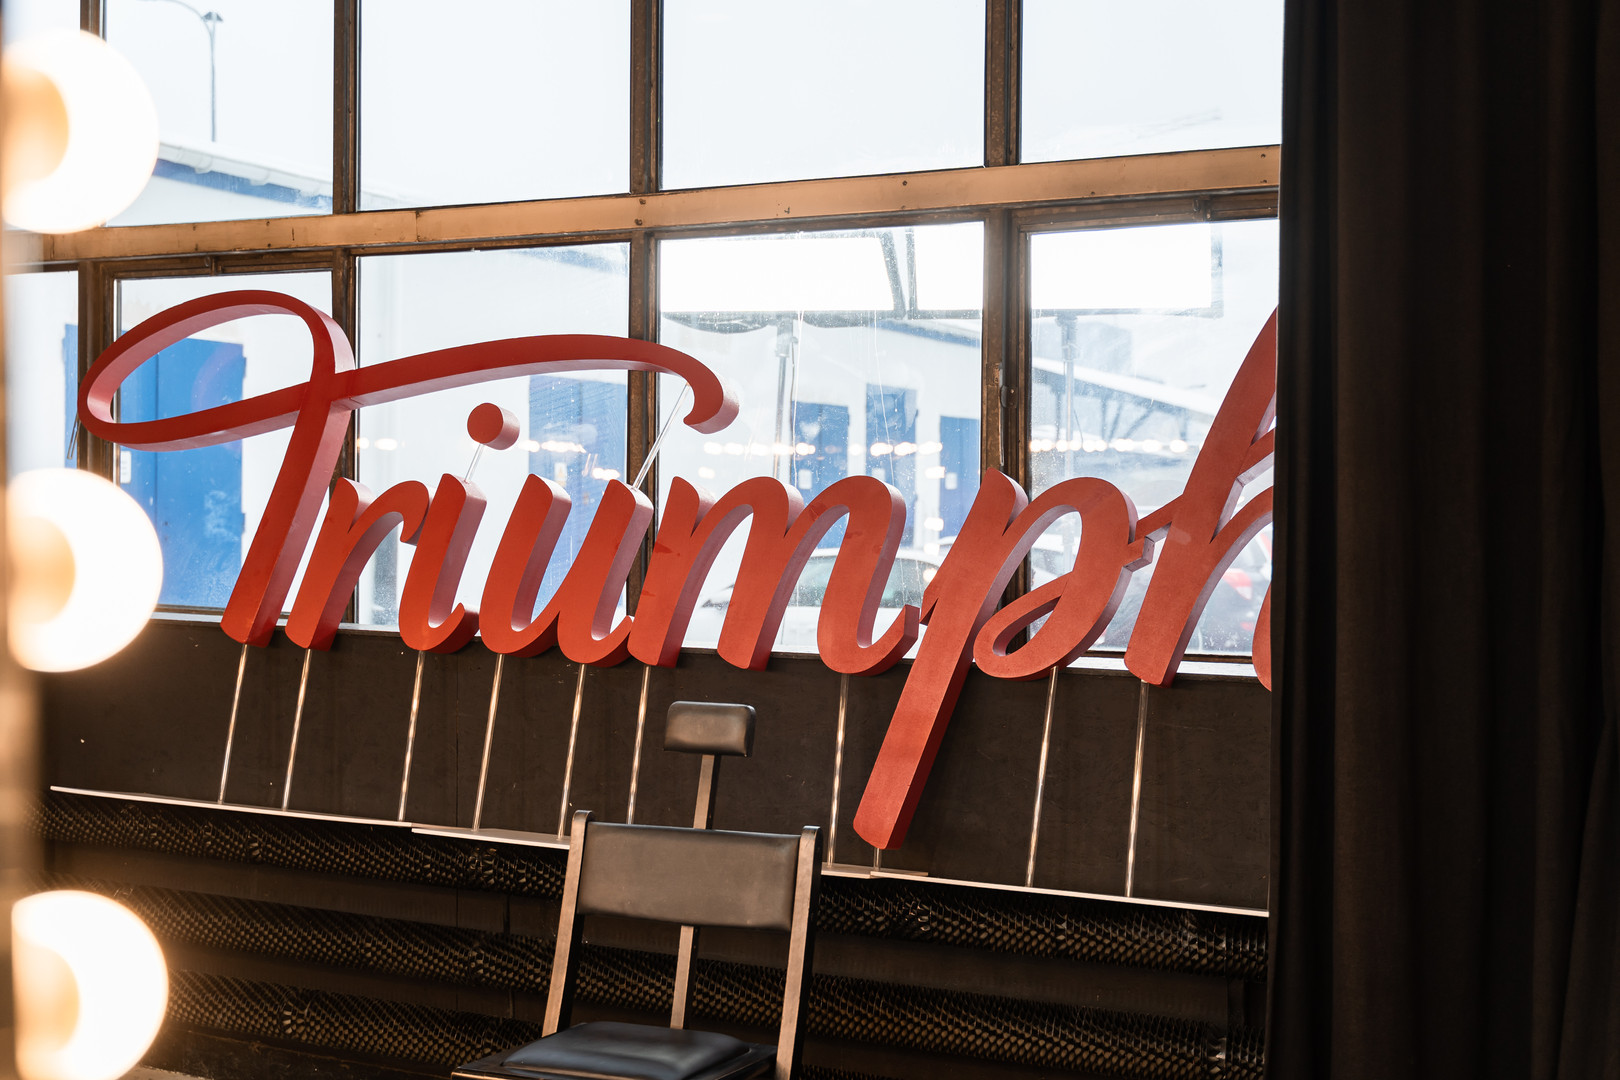 Triumph_Sloggi_Produkcja (10).JPG